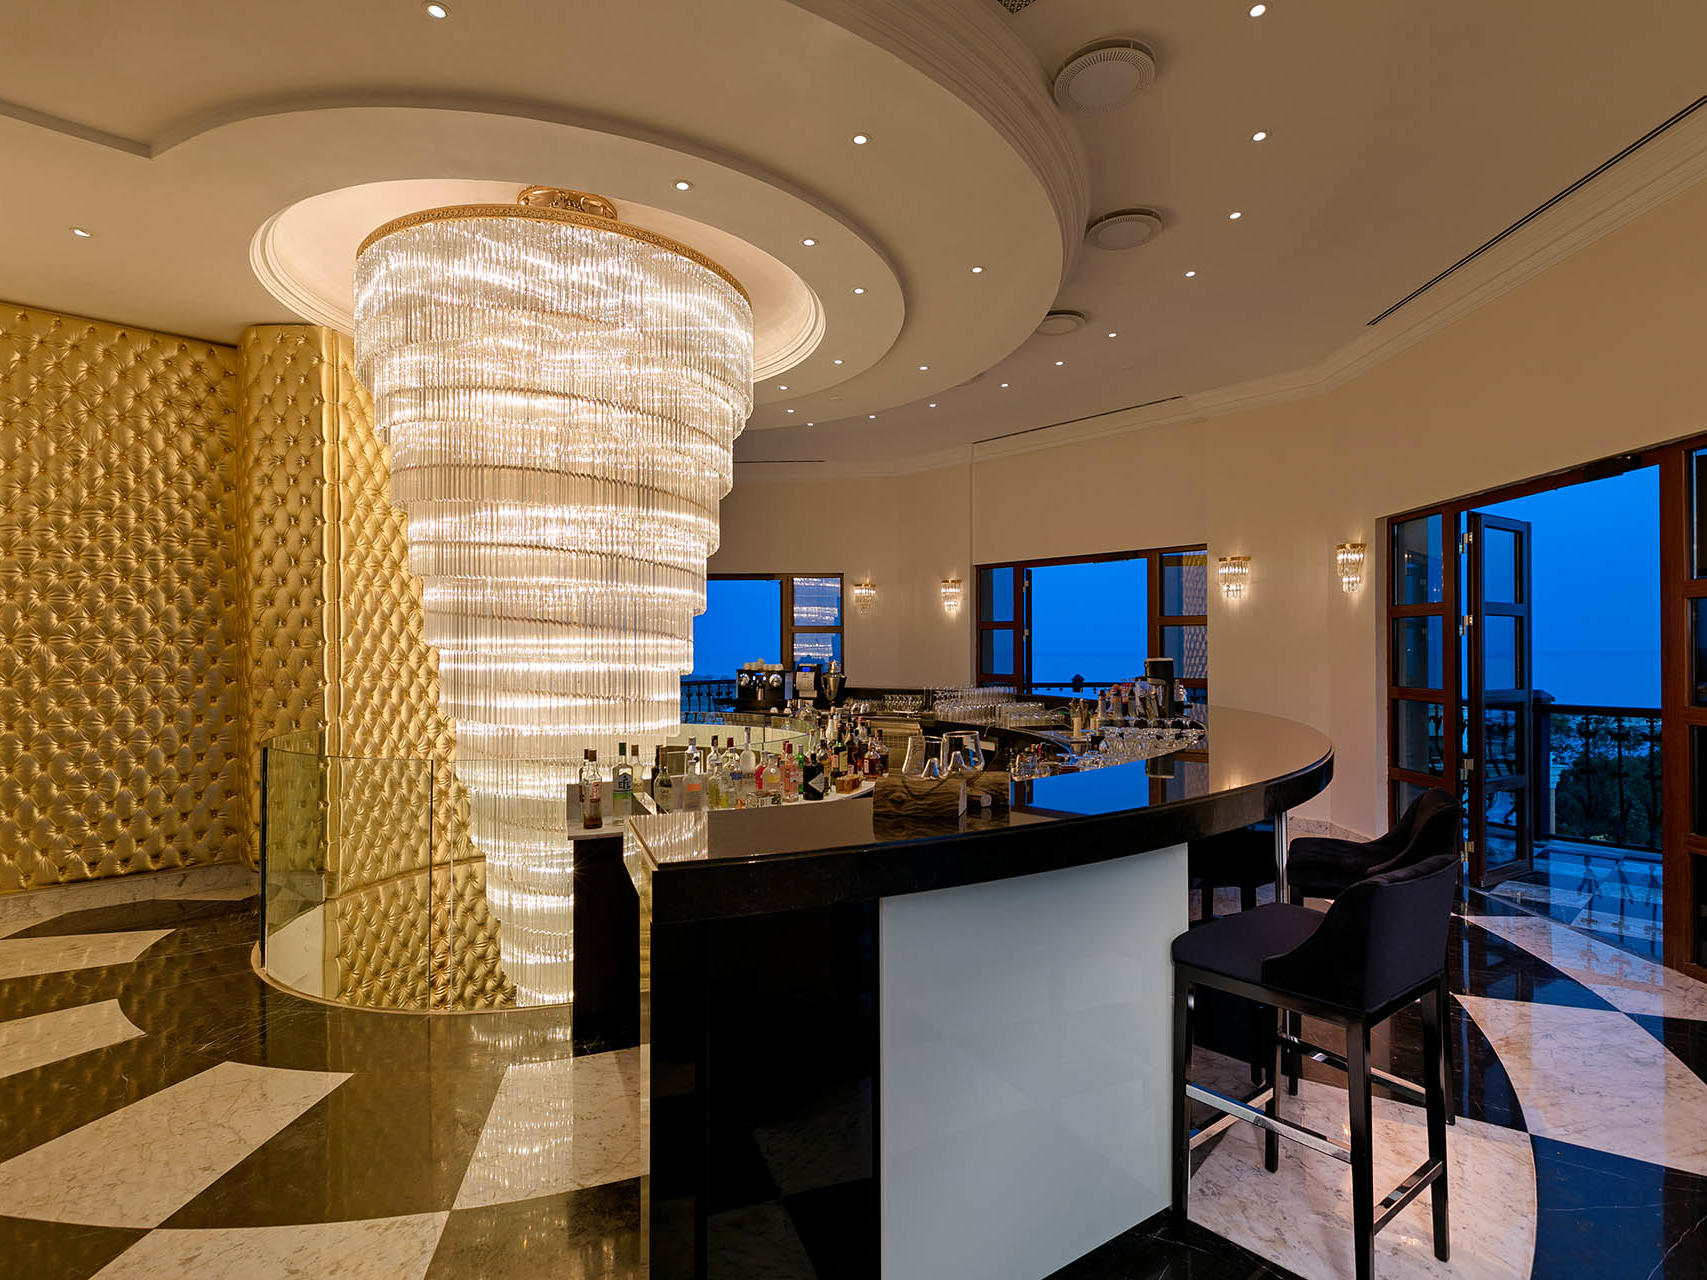 Mardanpalacehotel-Otel-Mermer-Dekorasyon- (13)